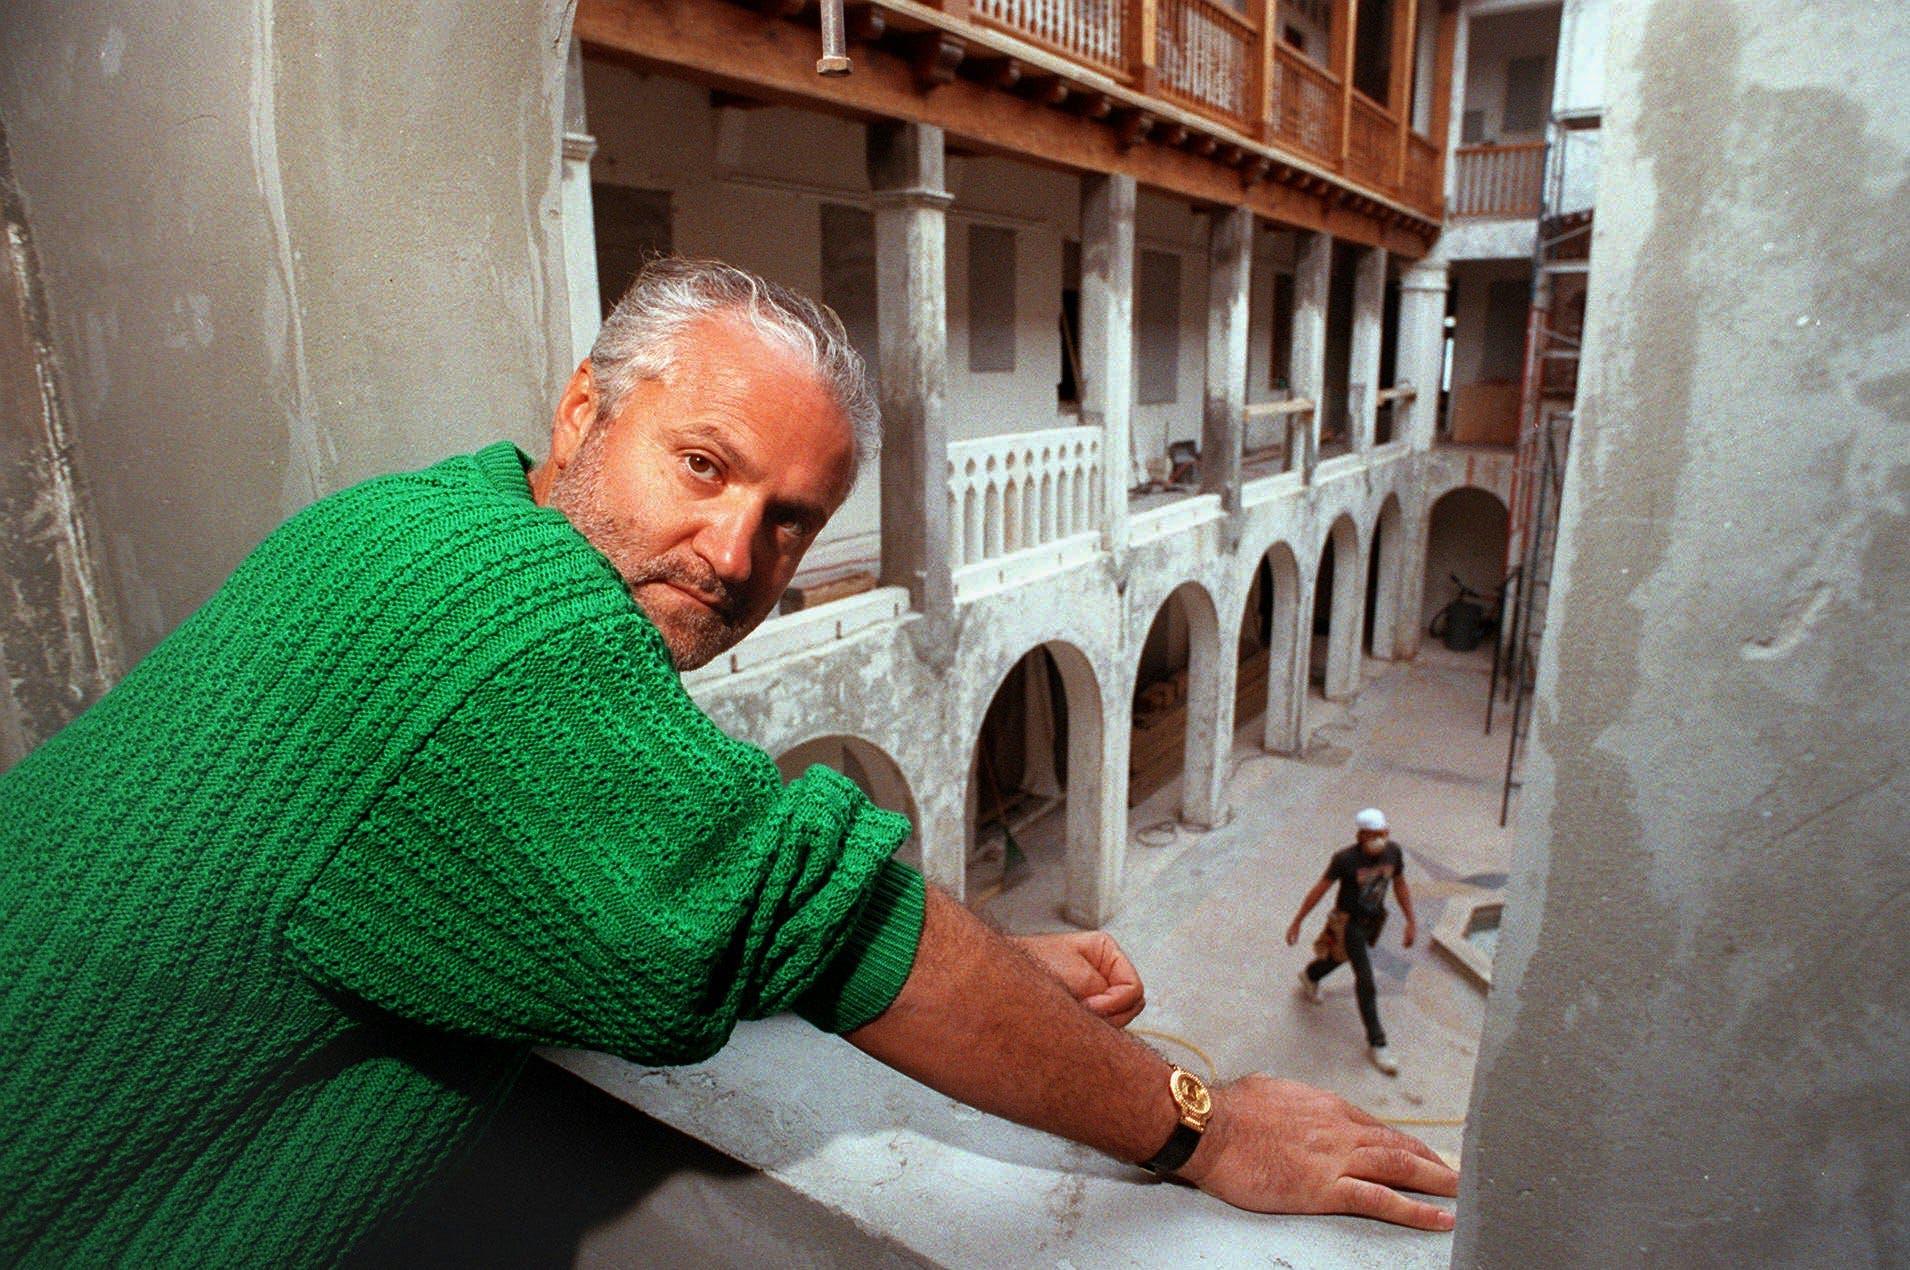 Historia de Gianni Versace